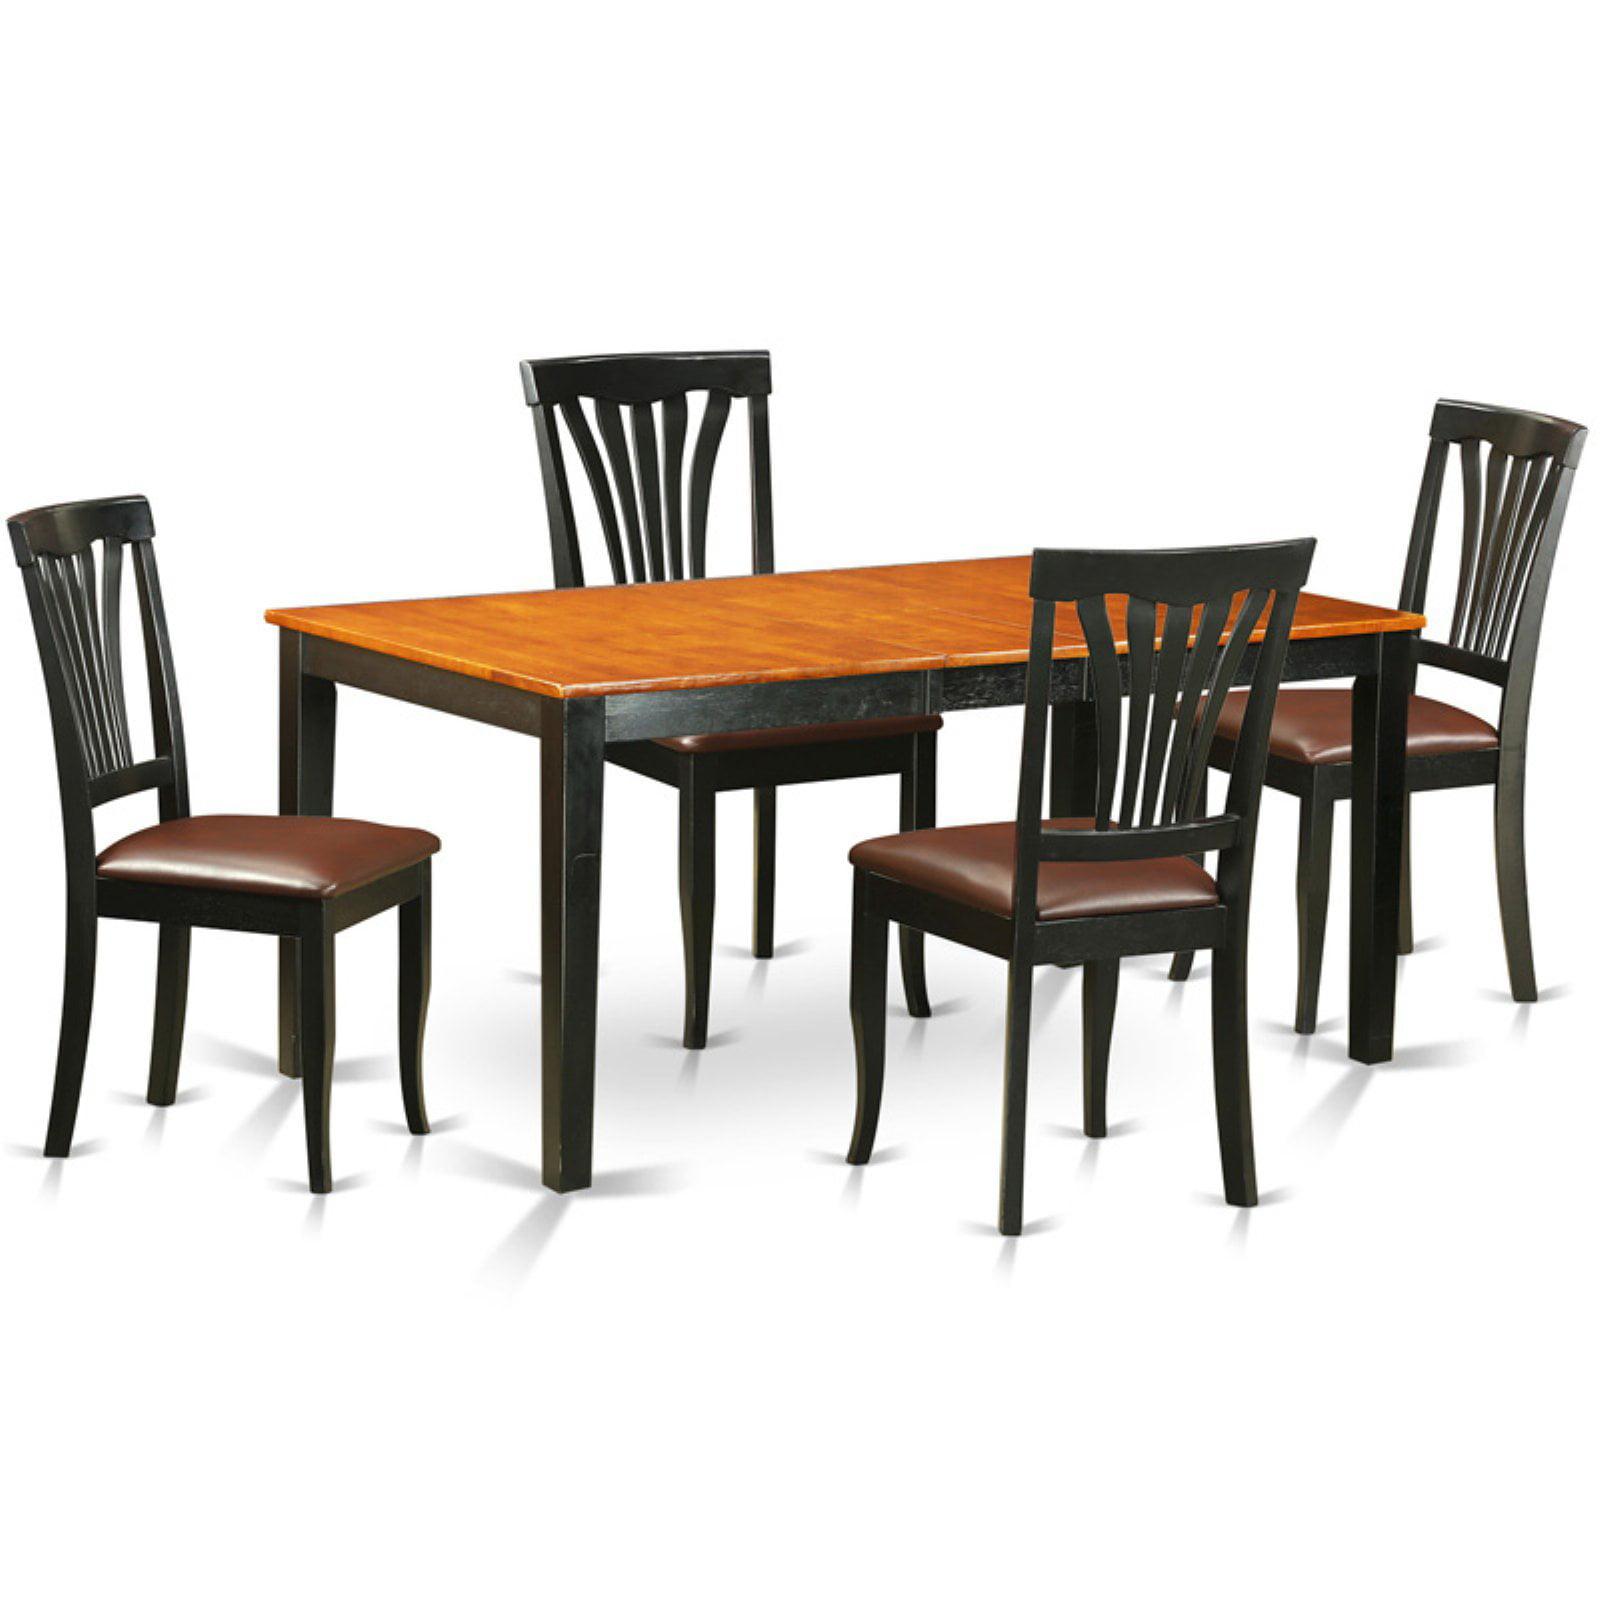 East West Nicoli 6 Piece Dining Set: East West Furniture Nicoli 5 Piece Lath Back Dining Table